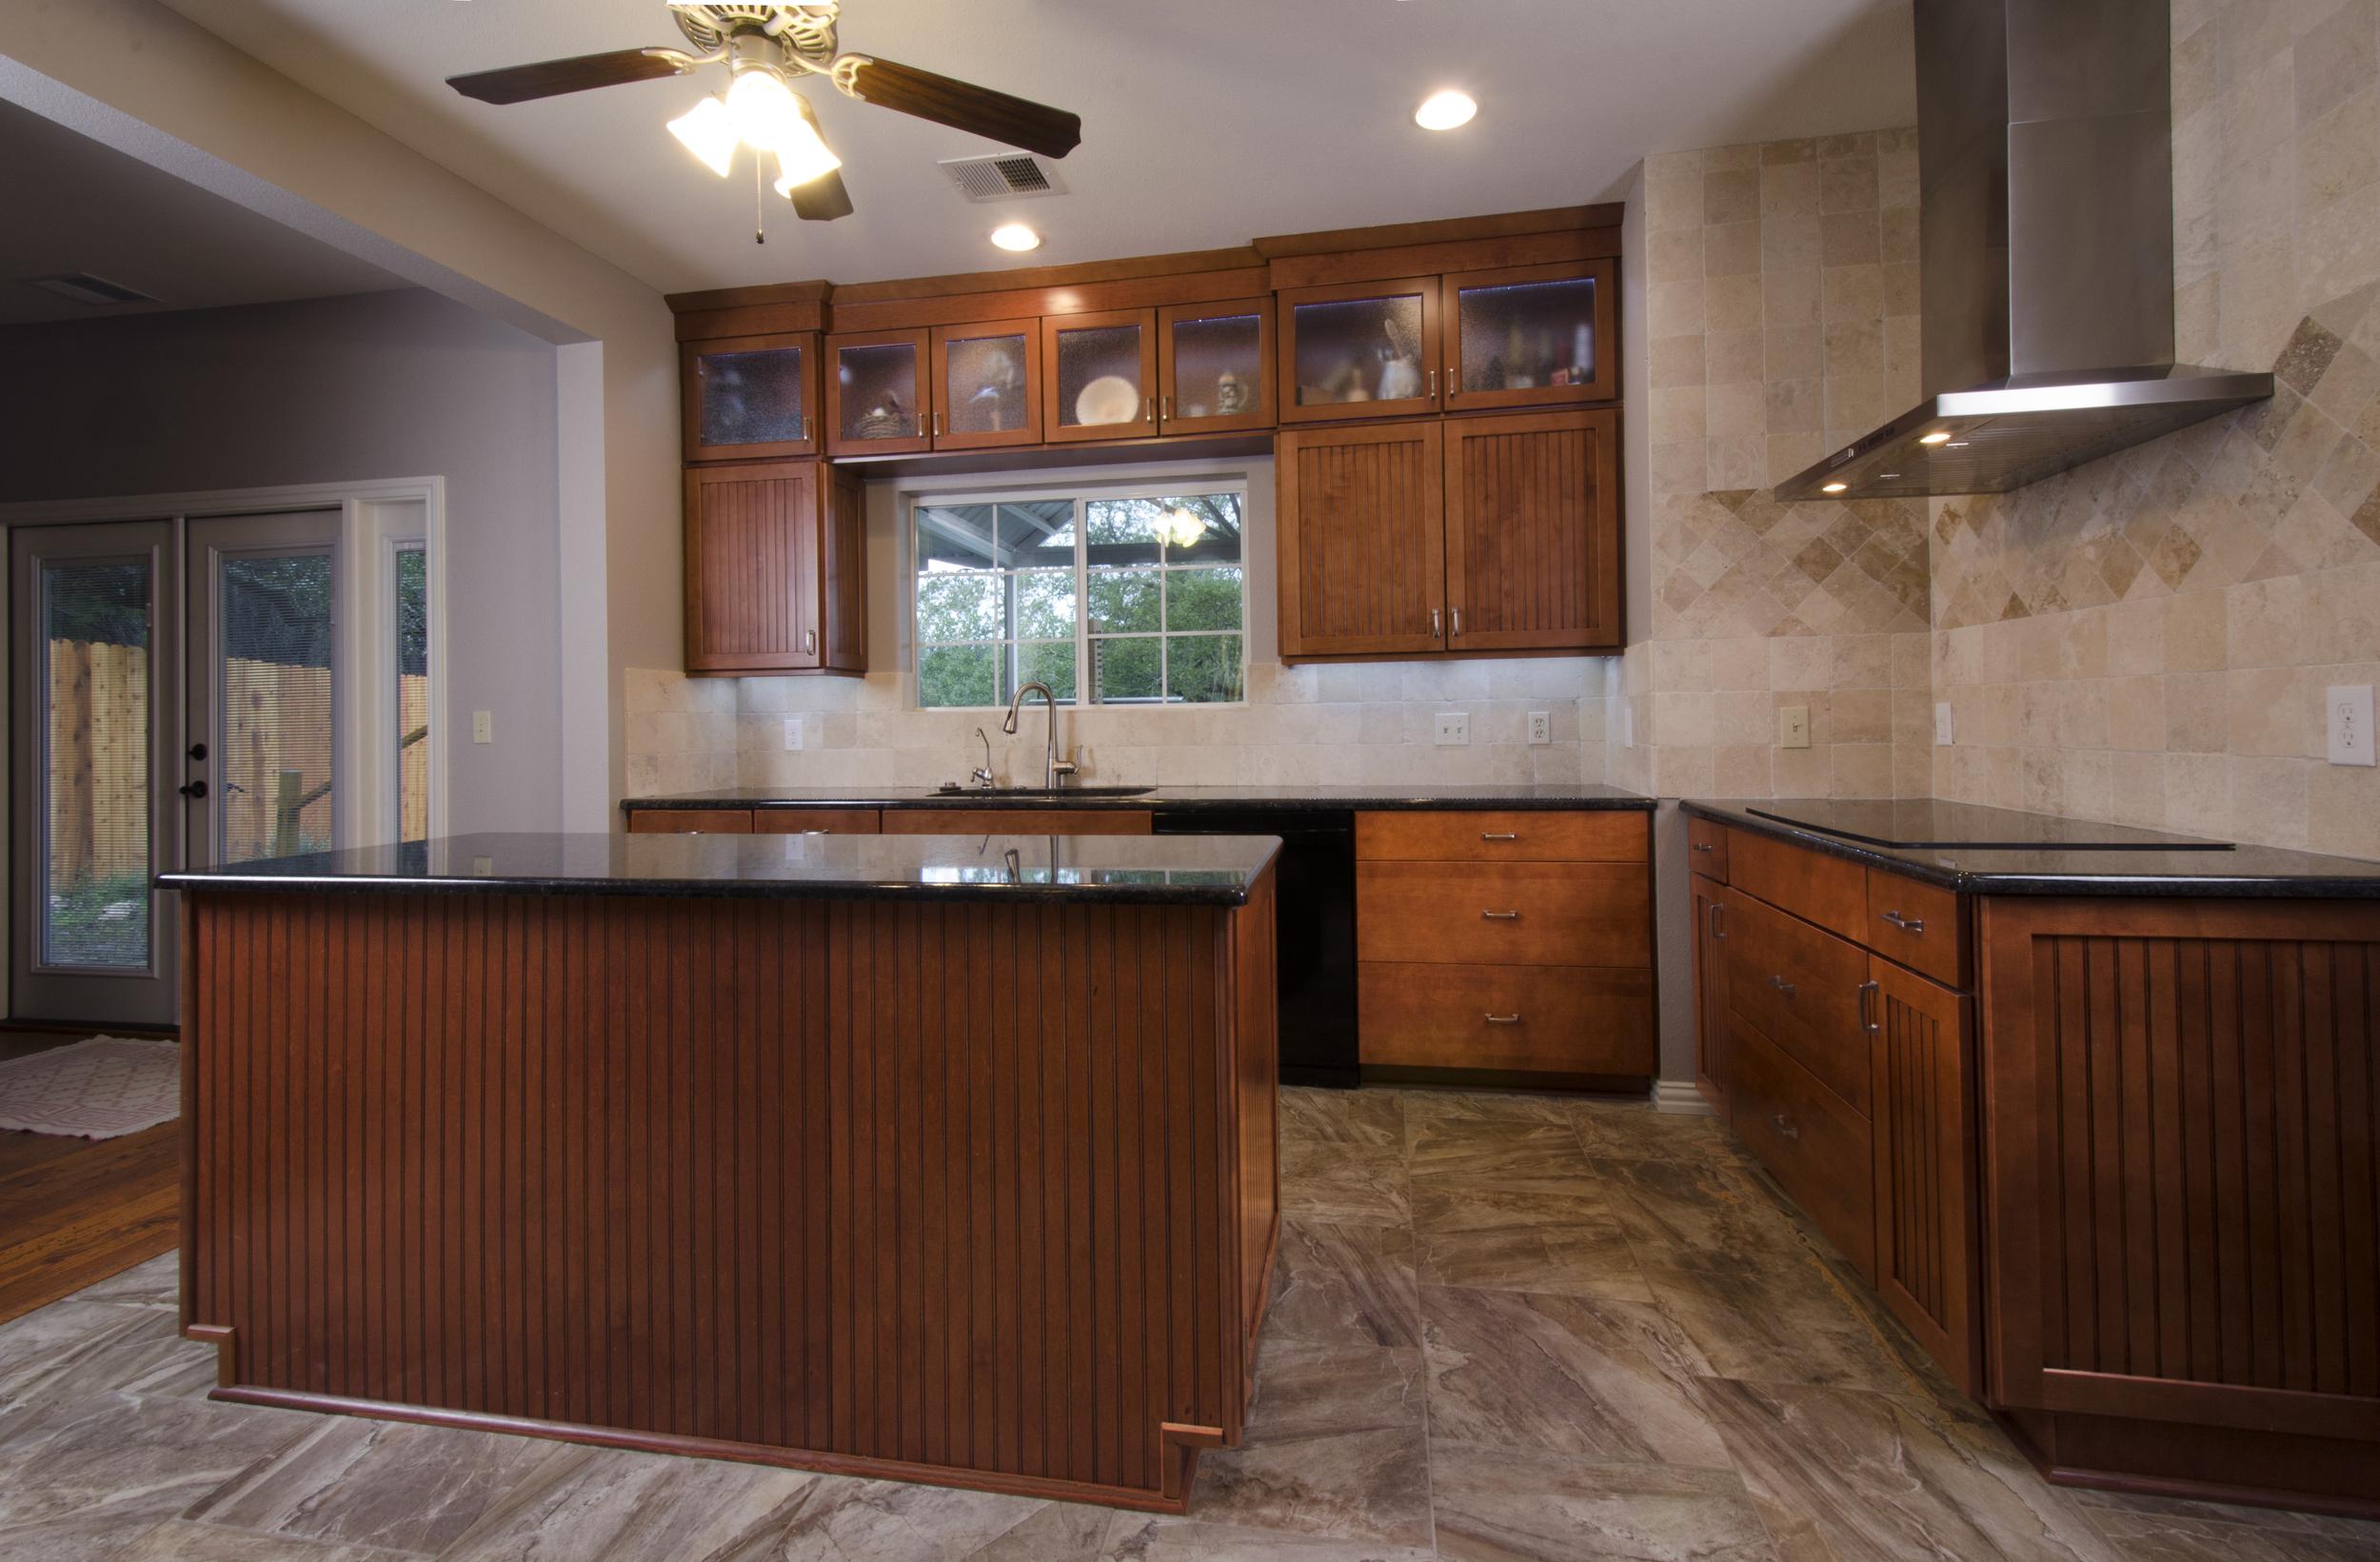 New-Braunfels_25_Rays-kitchen.jpg